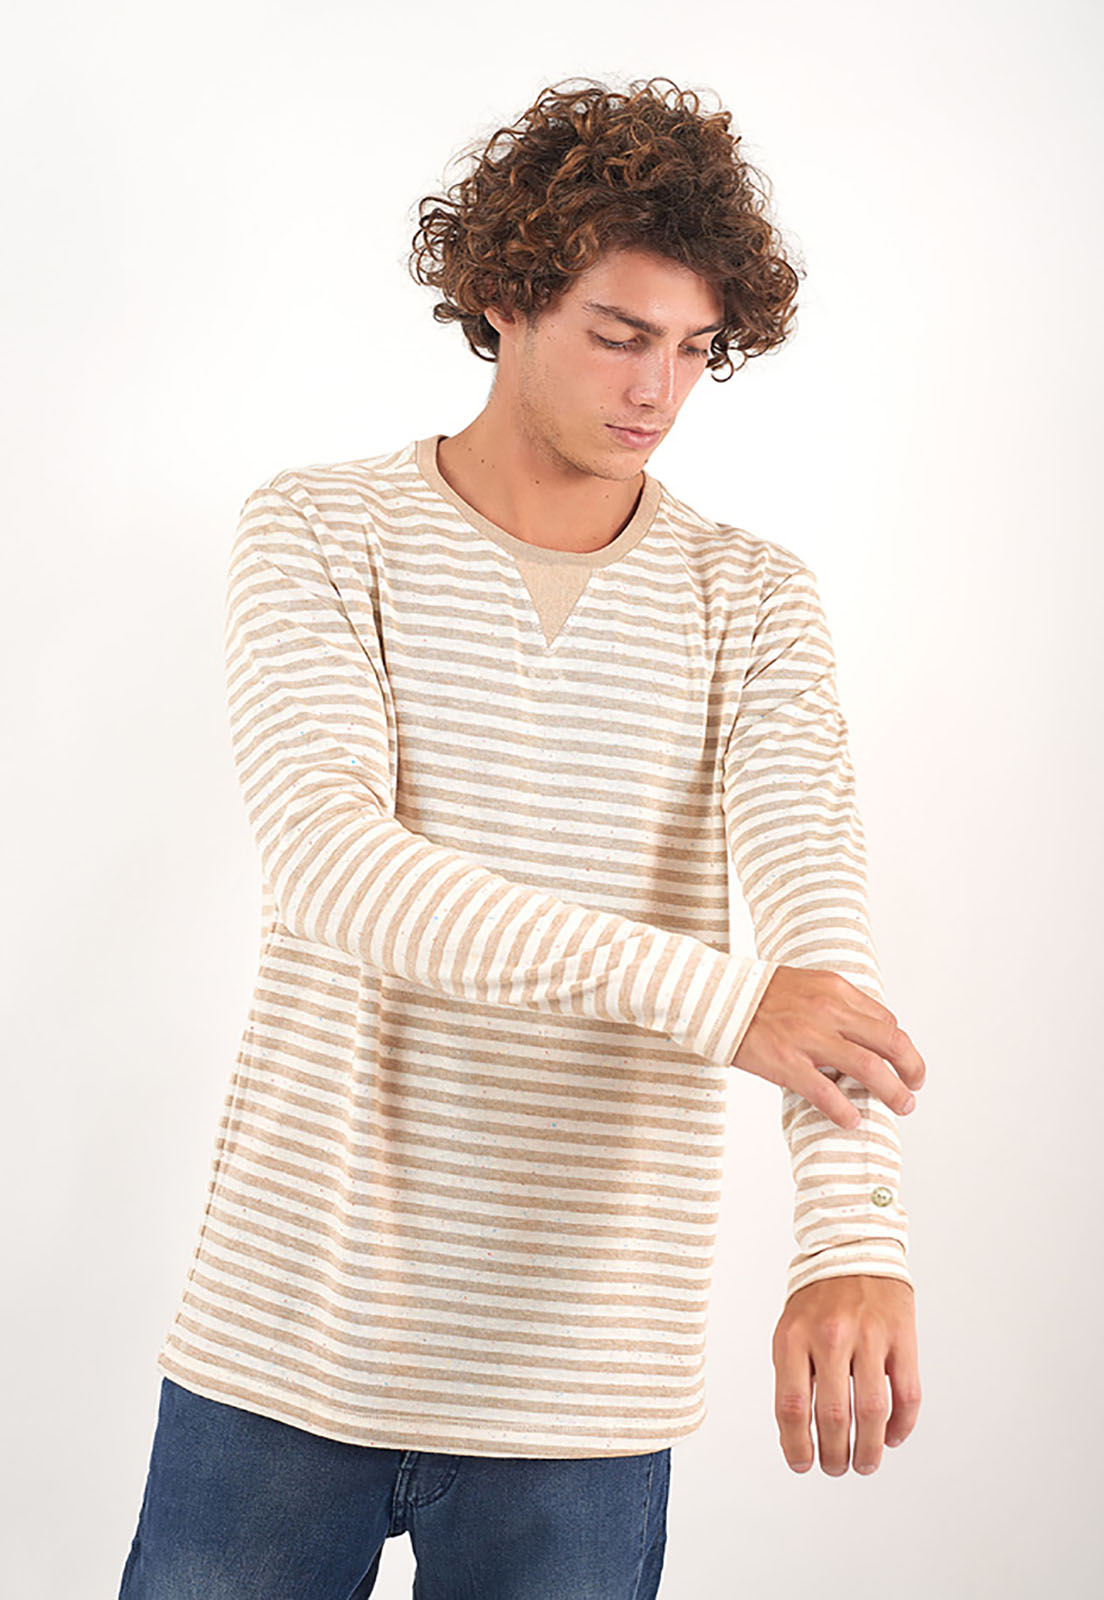 Blusa Golden Stripes melty